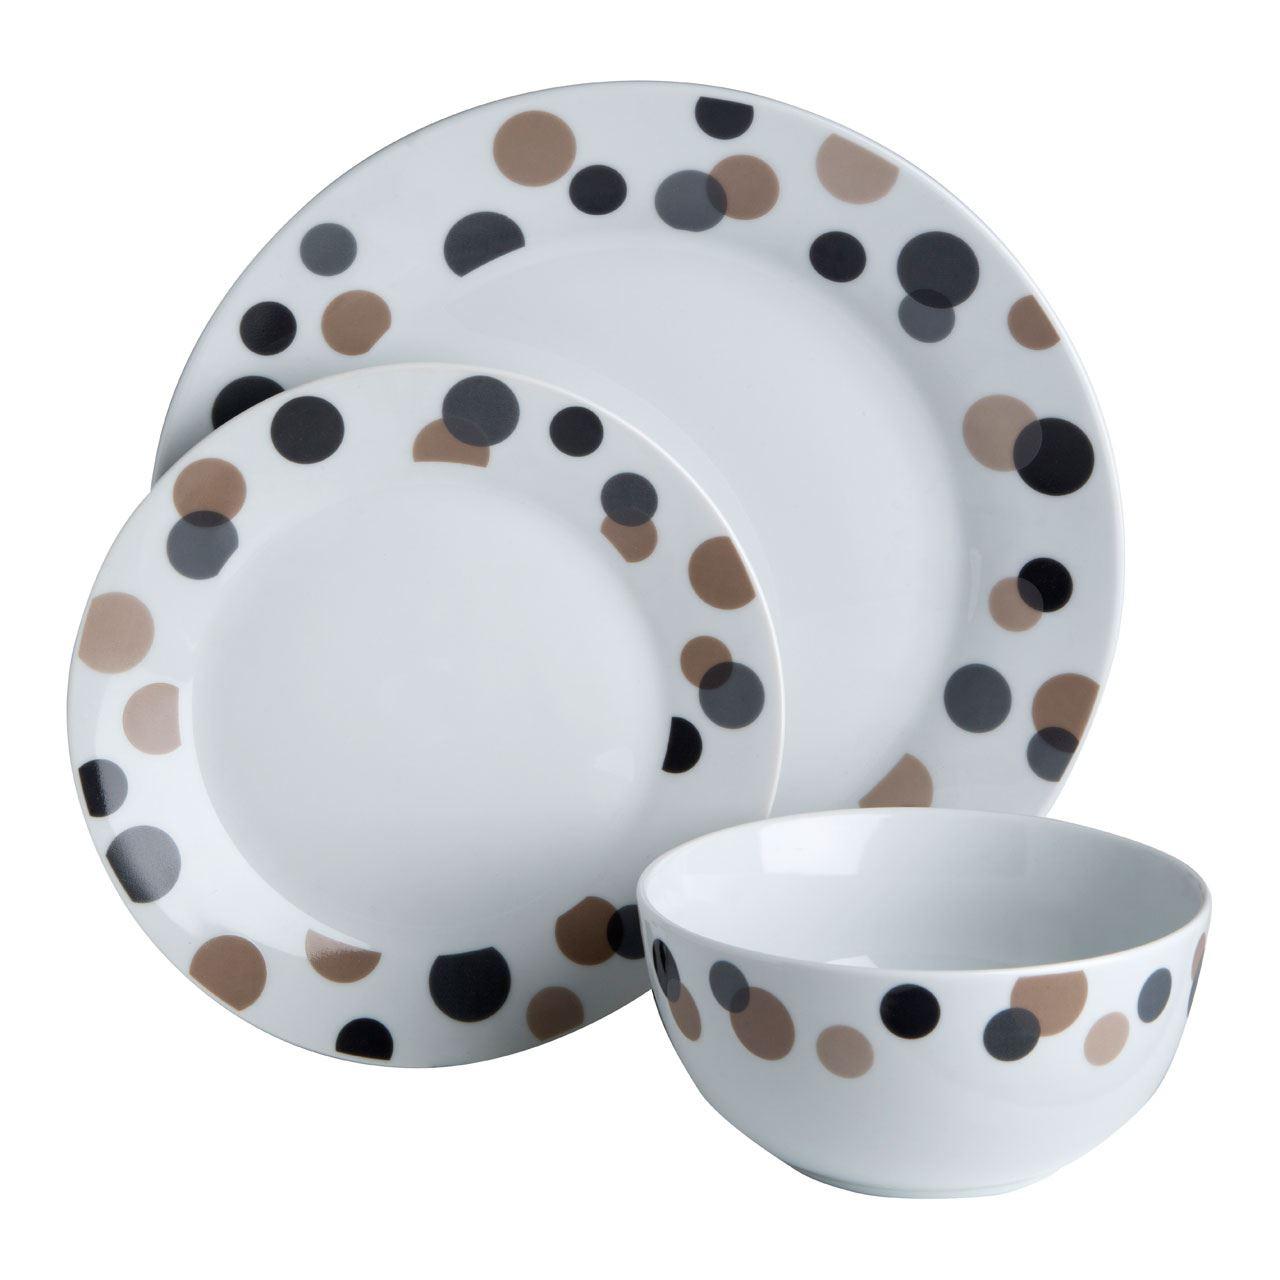 12 24 pcs dinner set porcelain kitchen serving plates for Kitchen set plates